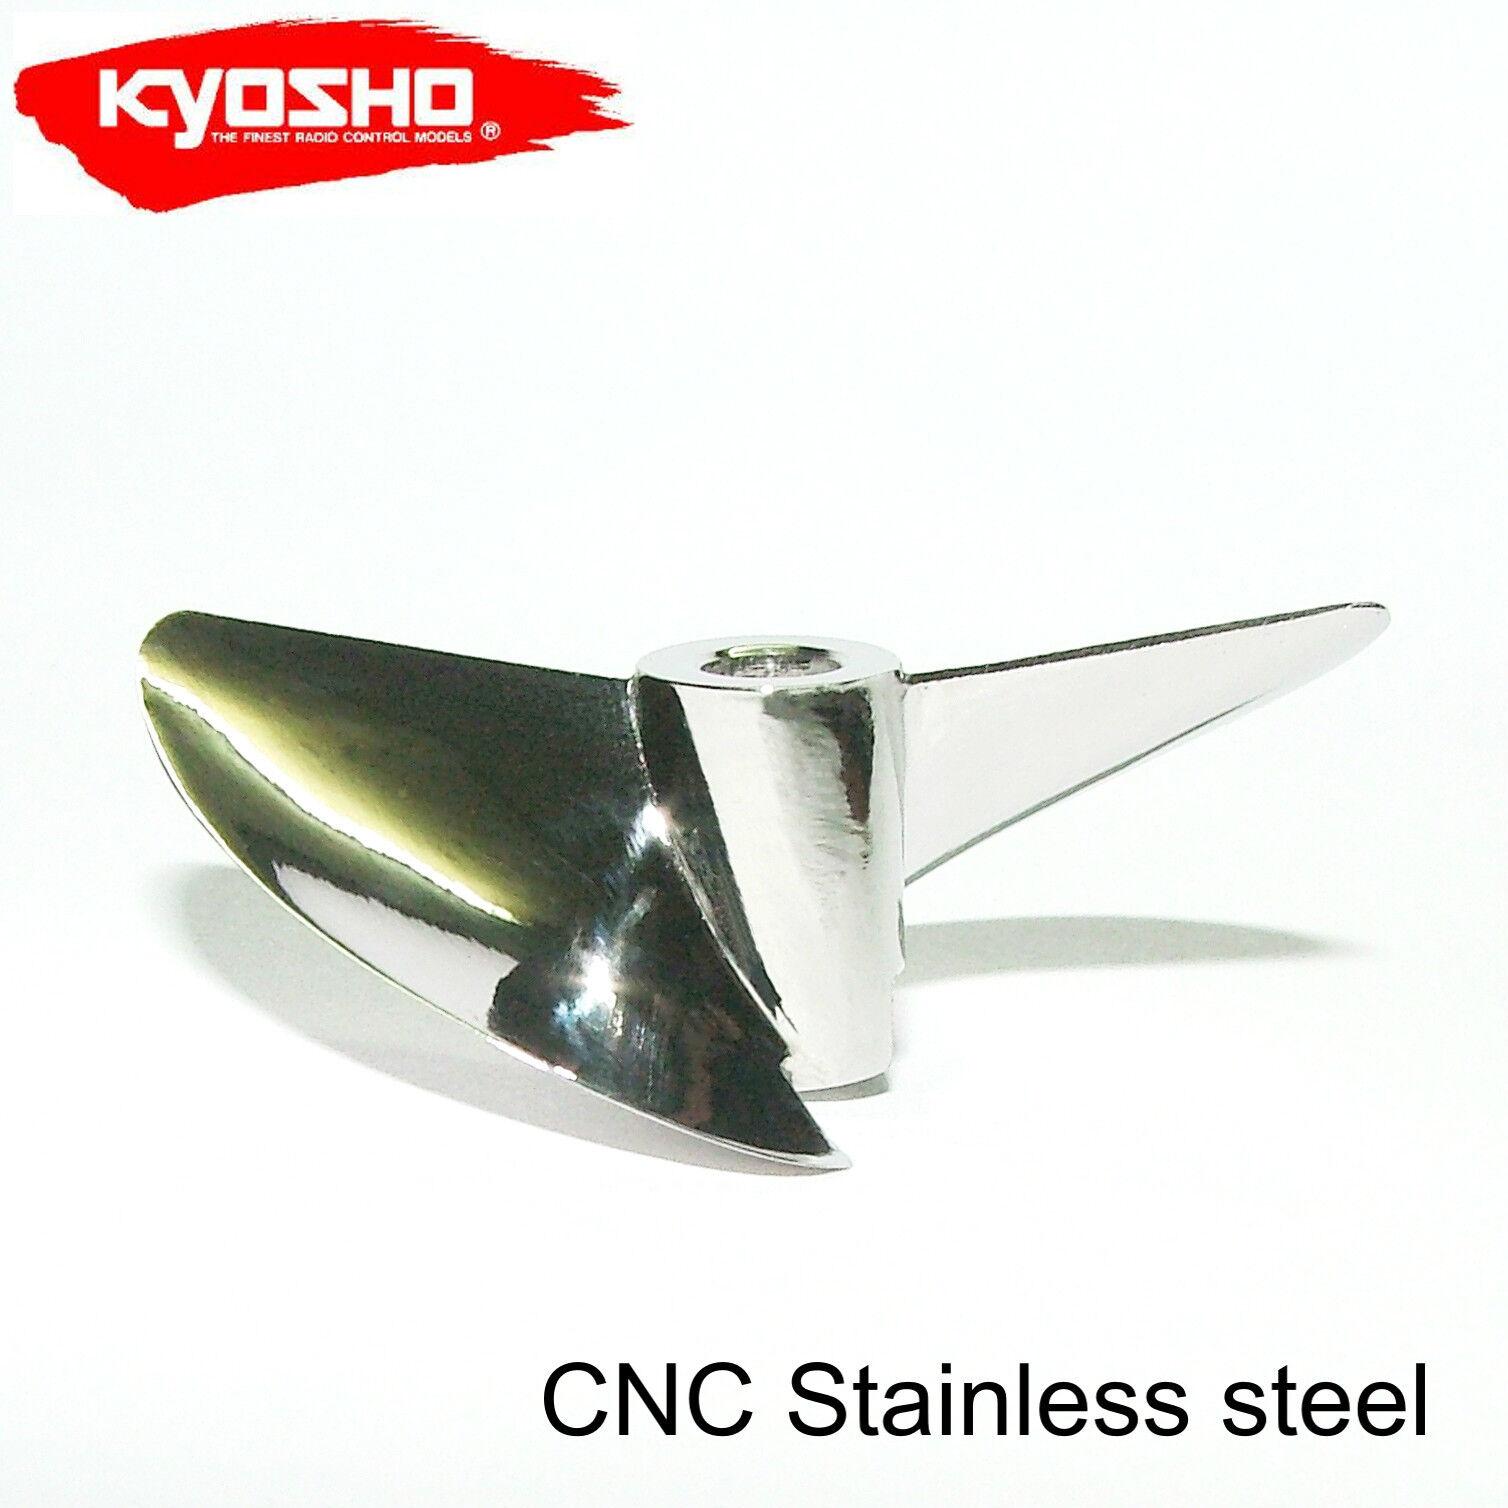 Kyosho JET STREAM 888VE, X543 CNC STAINLESS STEEL  PROPELLER RC BOAT PROP  presa di marca